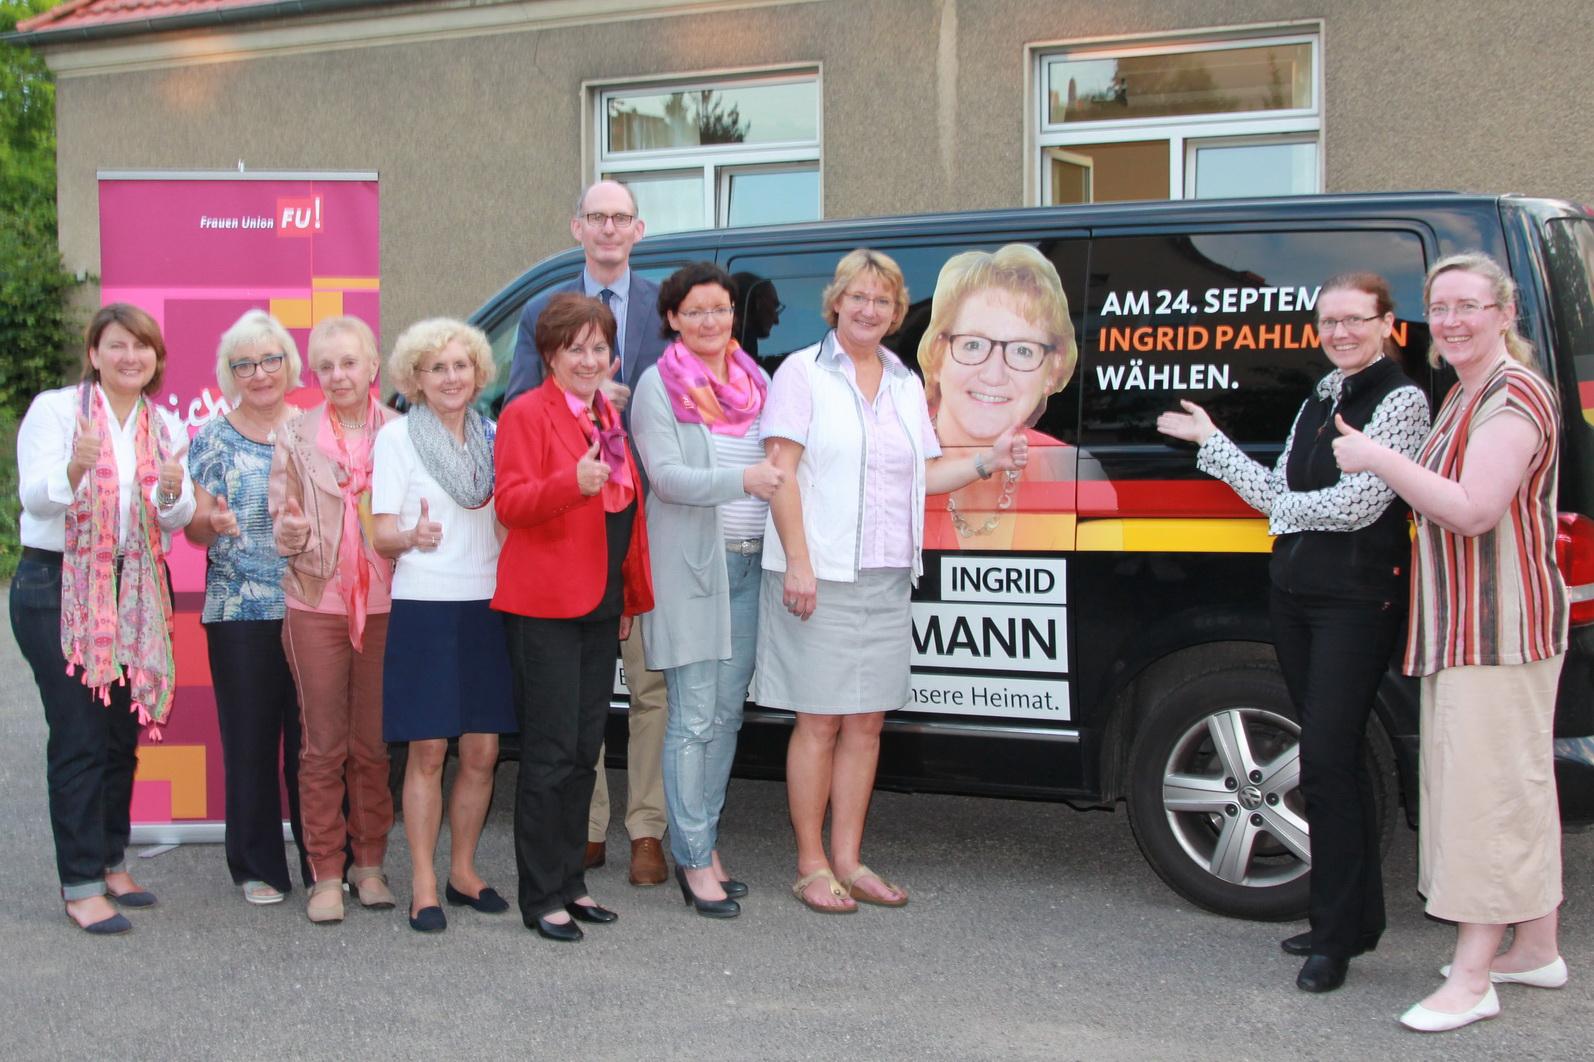 1.v.r. Ingrid Pahlmann MdB, 2.v.r. Marion Övermöhle-Mühlbach